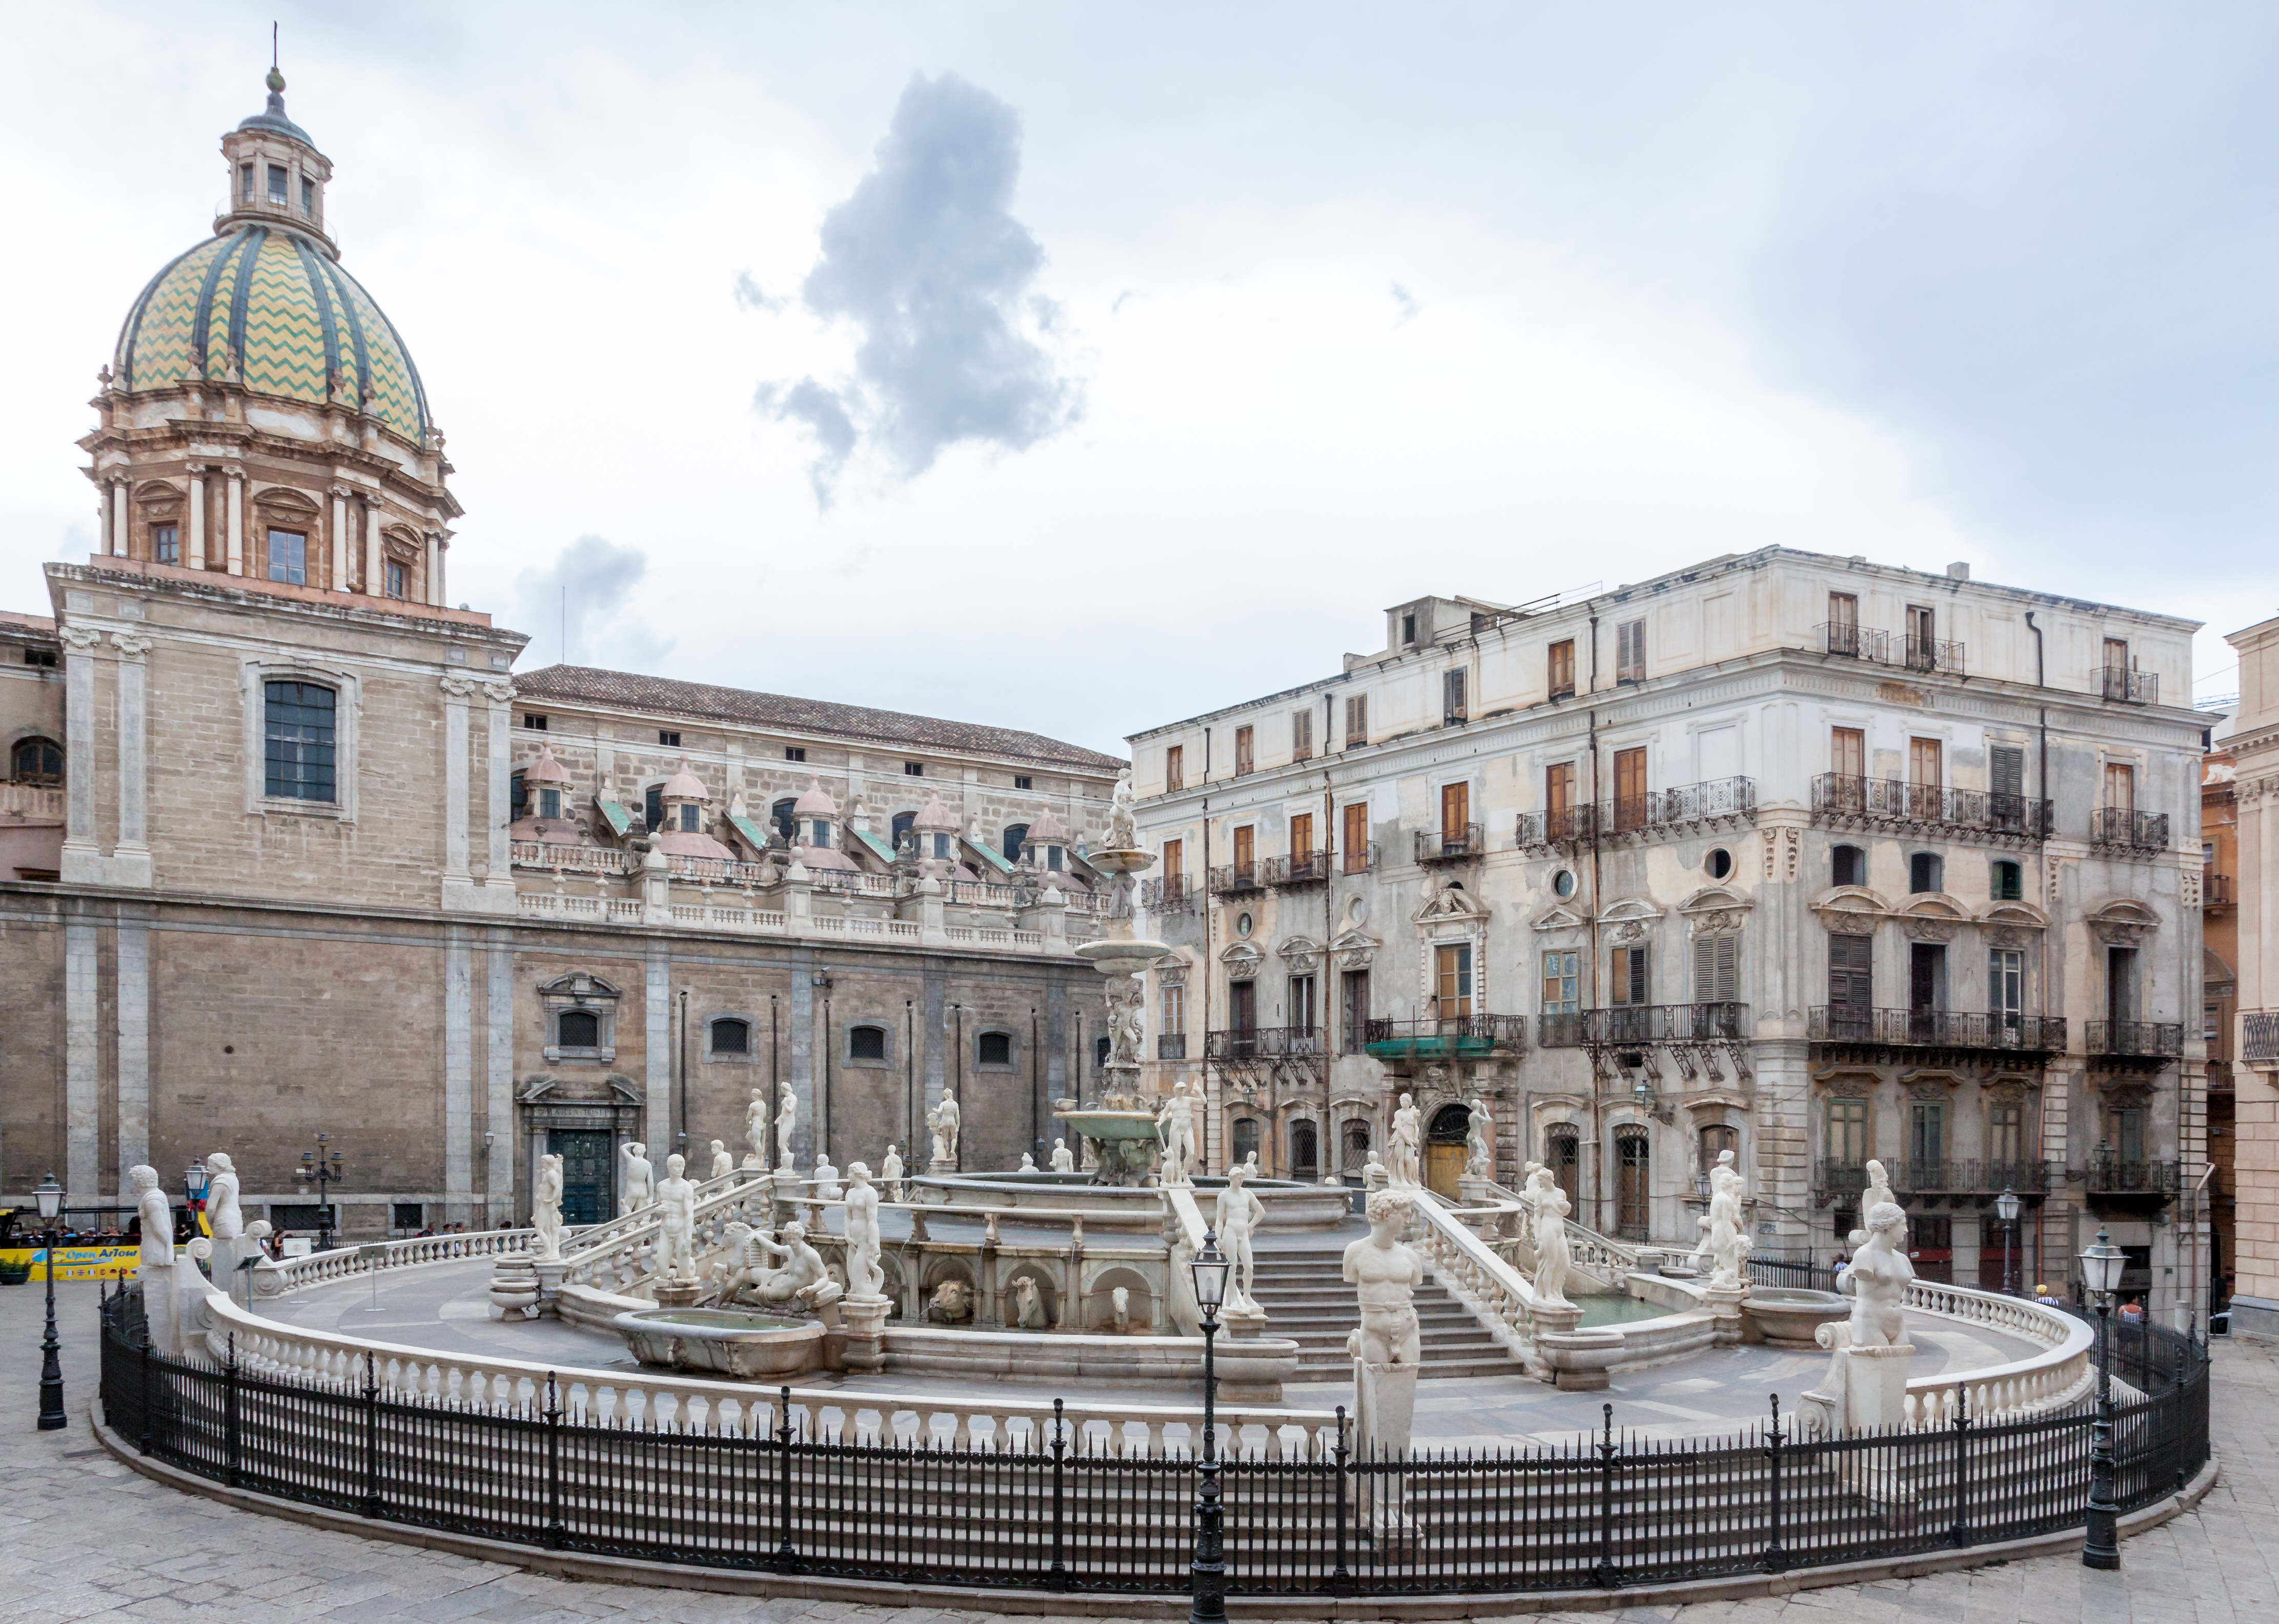 File:Fontana pretoria (Palermo) msu2017-0515.jpg - Wikimedia Commons